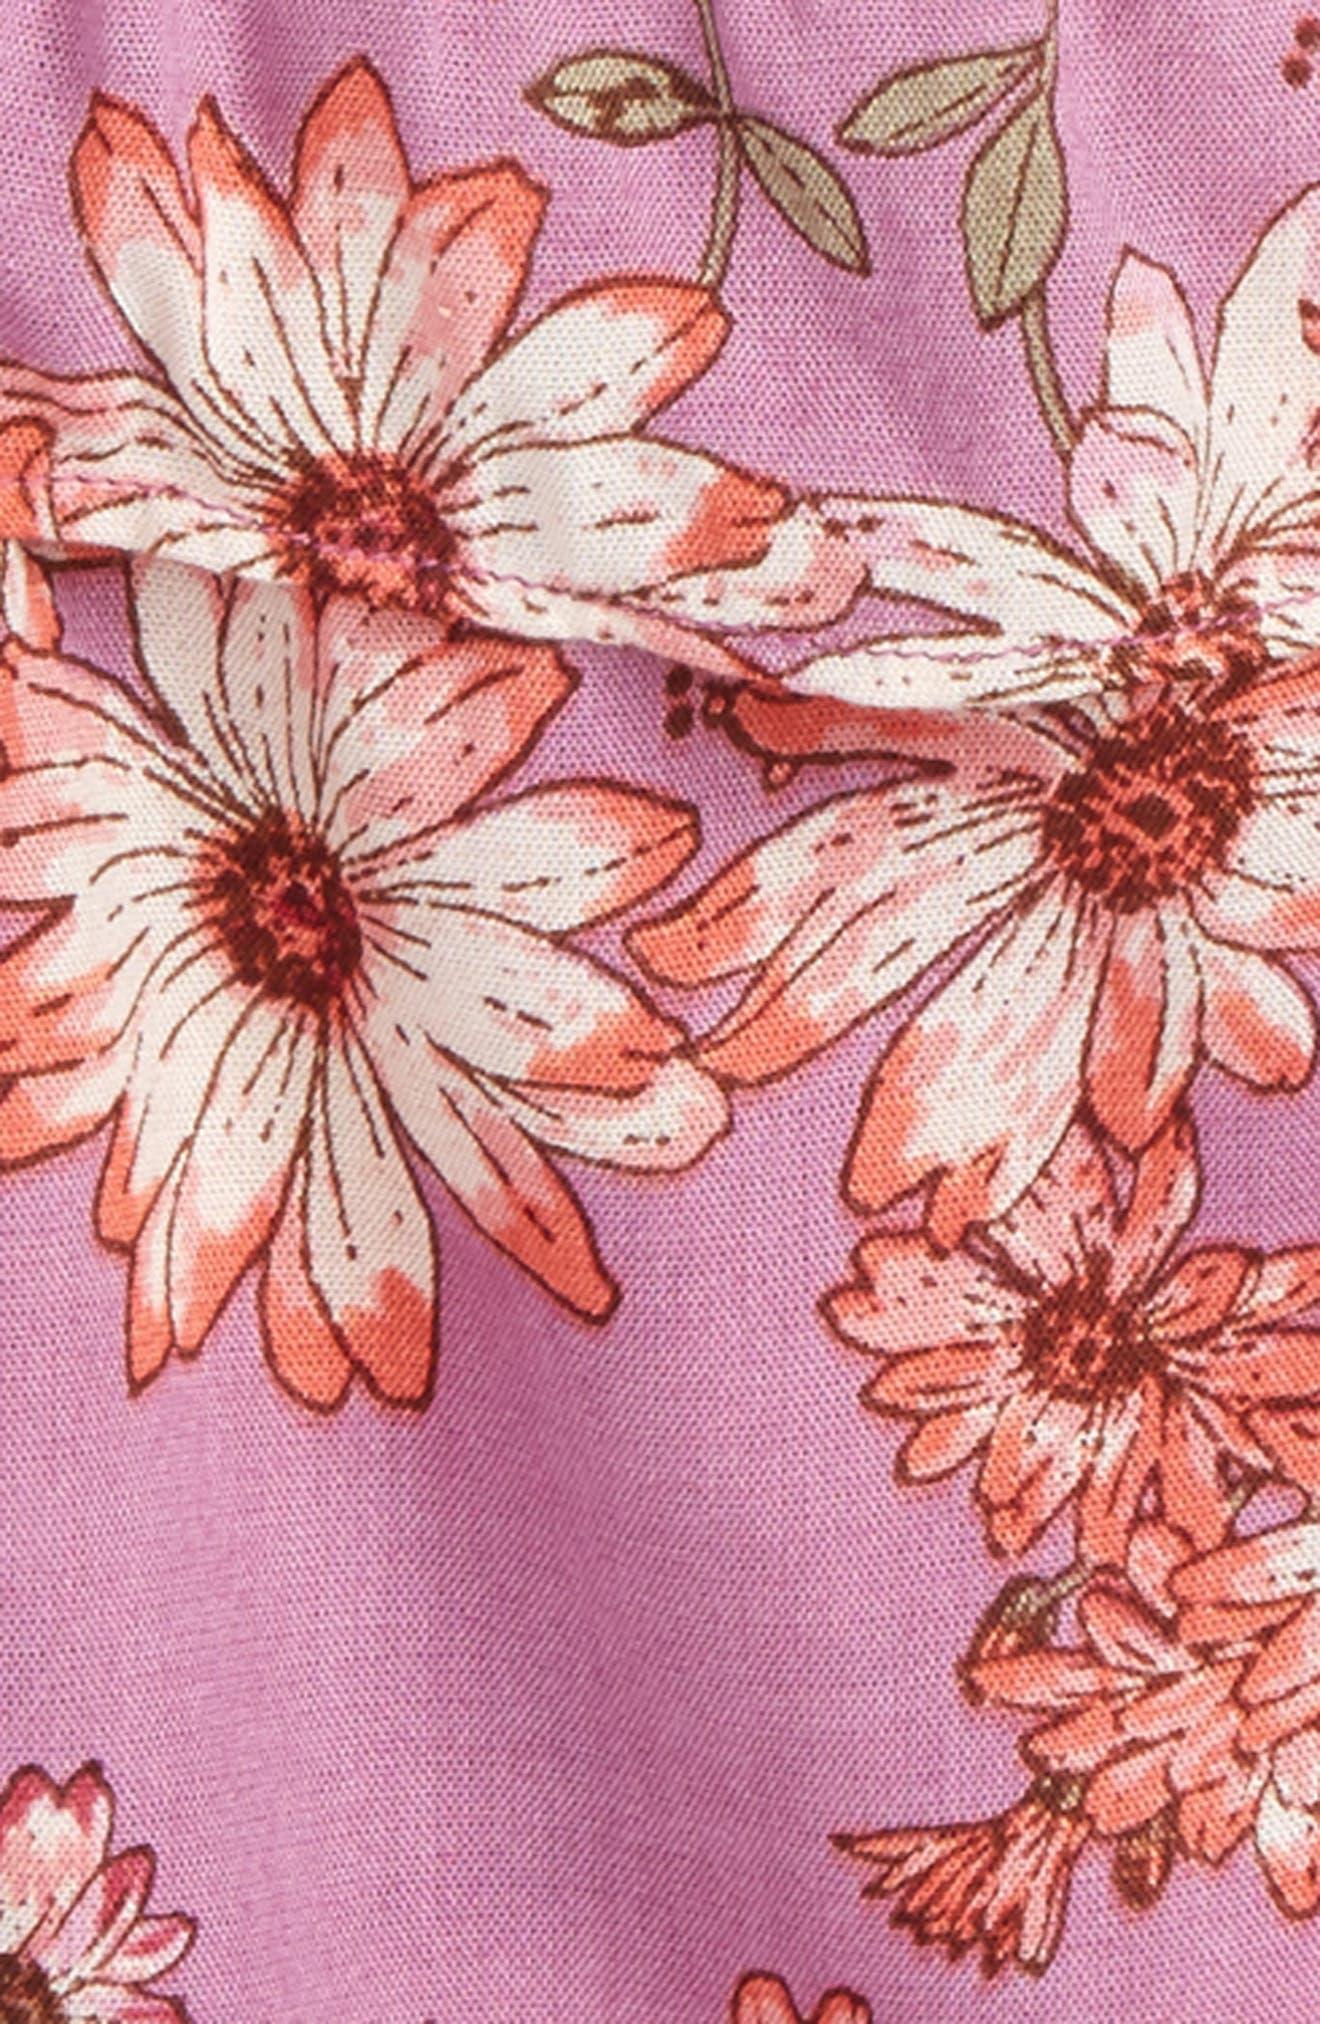 Hula Cold Shoulder Top,                             Alternate thumbnail 2, color,                             Dusty Lavender